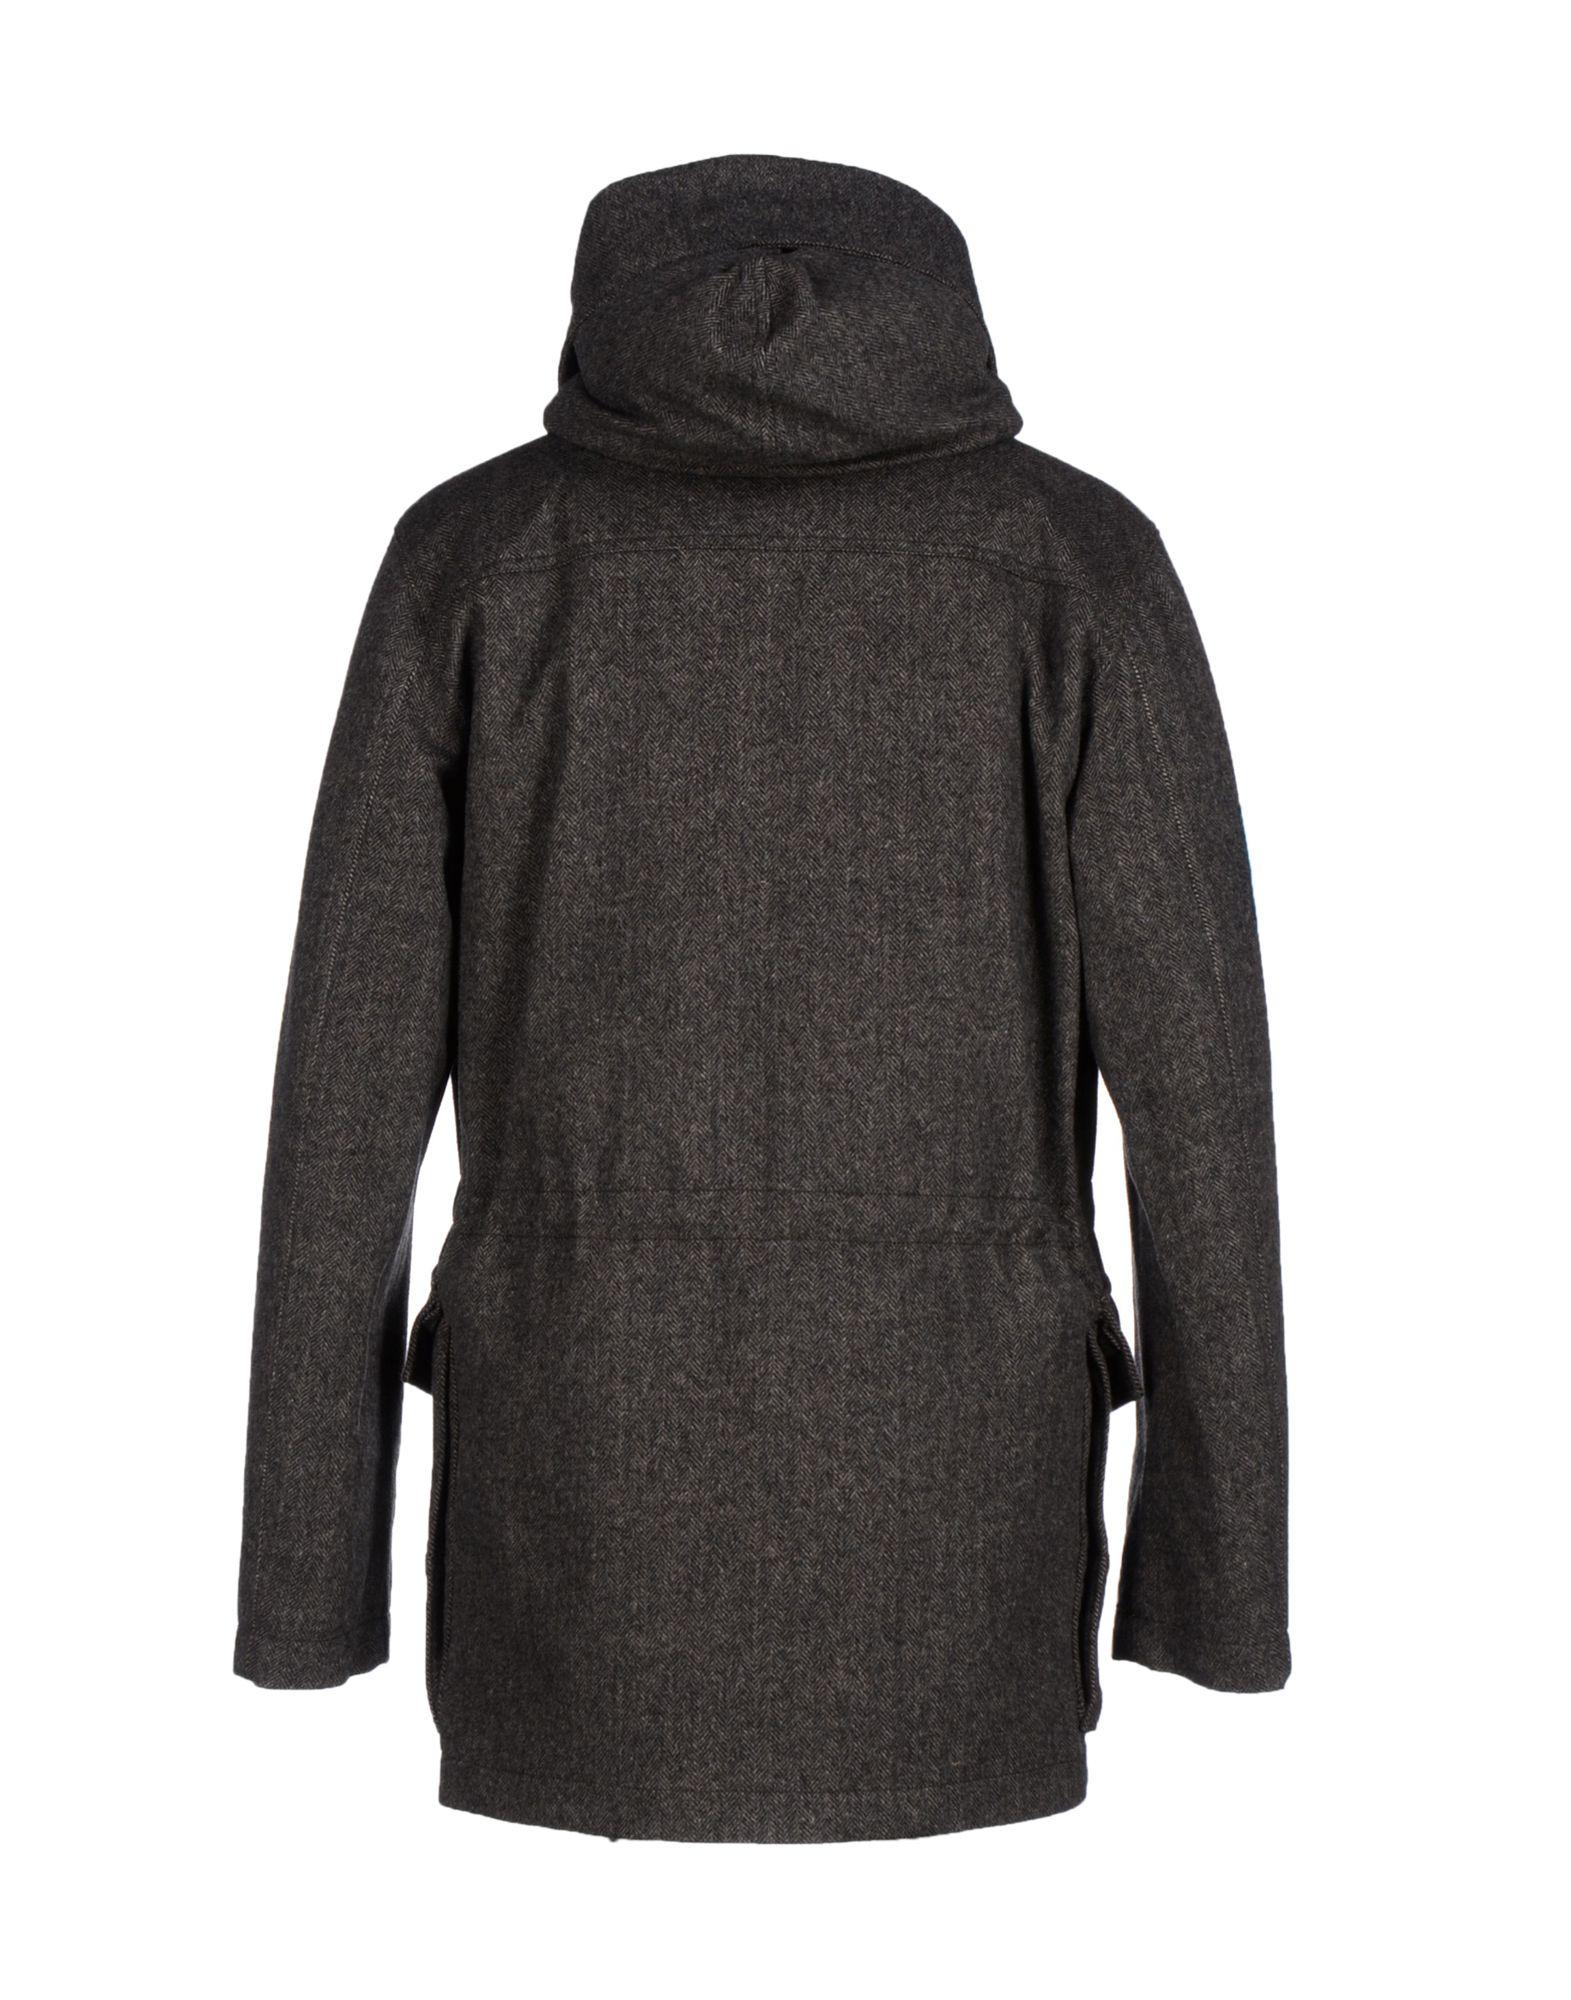 lyst dolce gabbana down jacket in gray for men. Black Bedroom Furniture Sets. Home Design Ideas